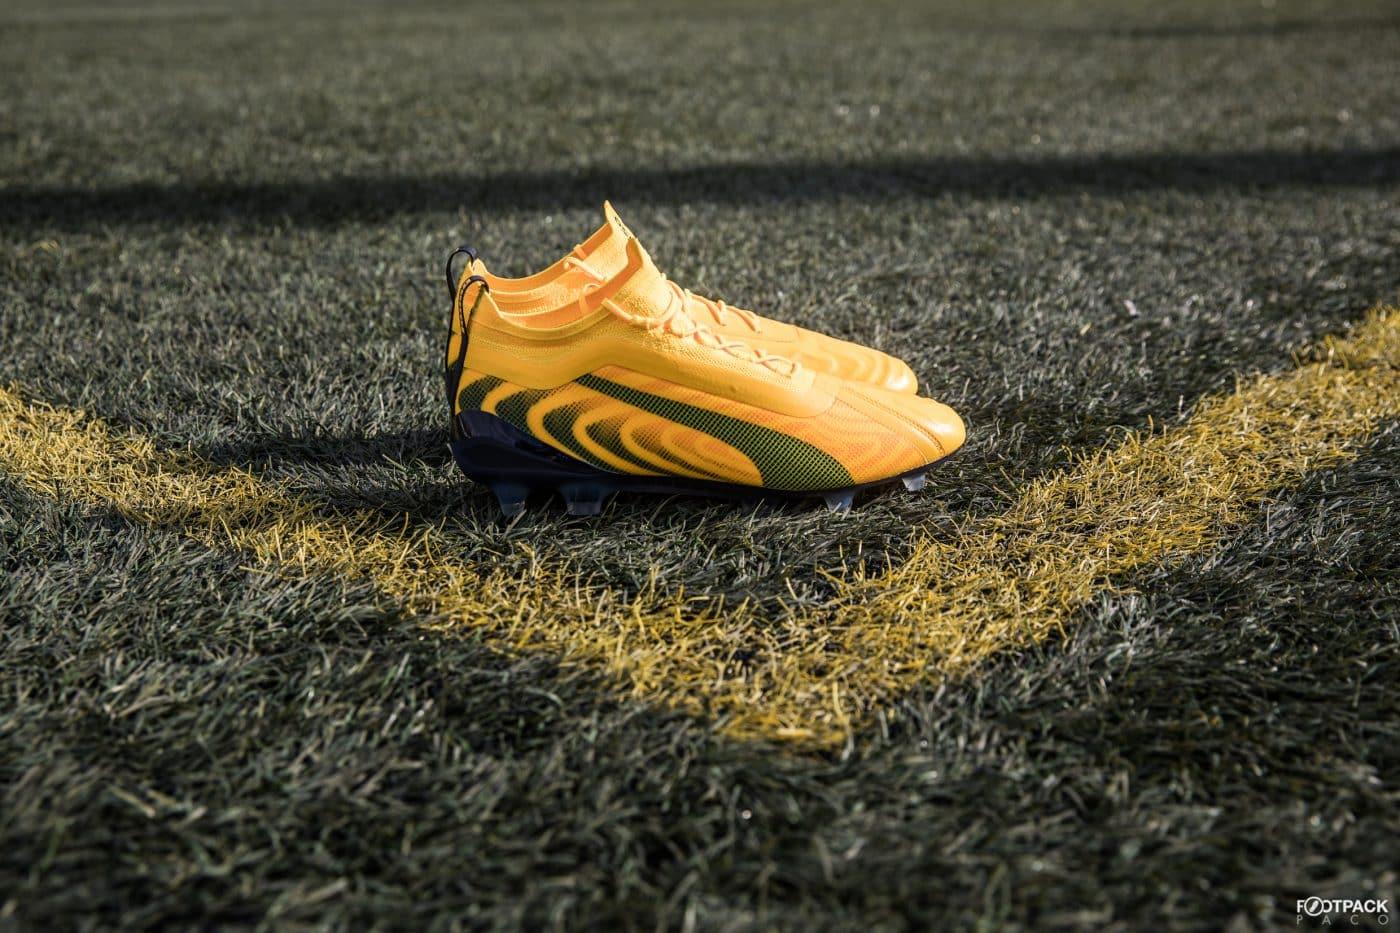 chaussures-de-foot-puma-one-5.1-spark-janvier-2020-footpack-3